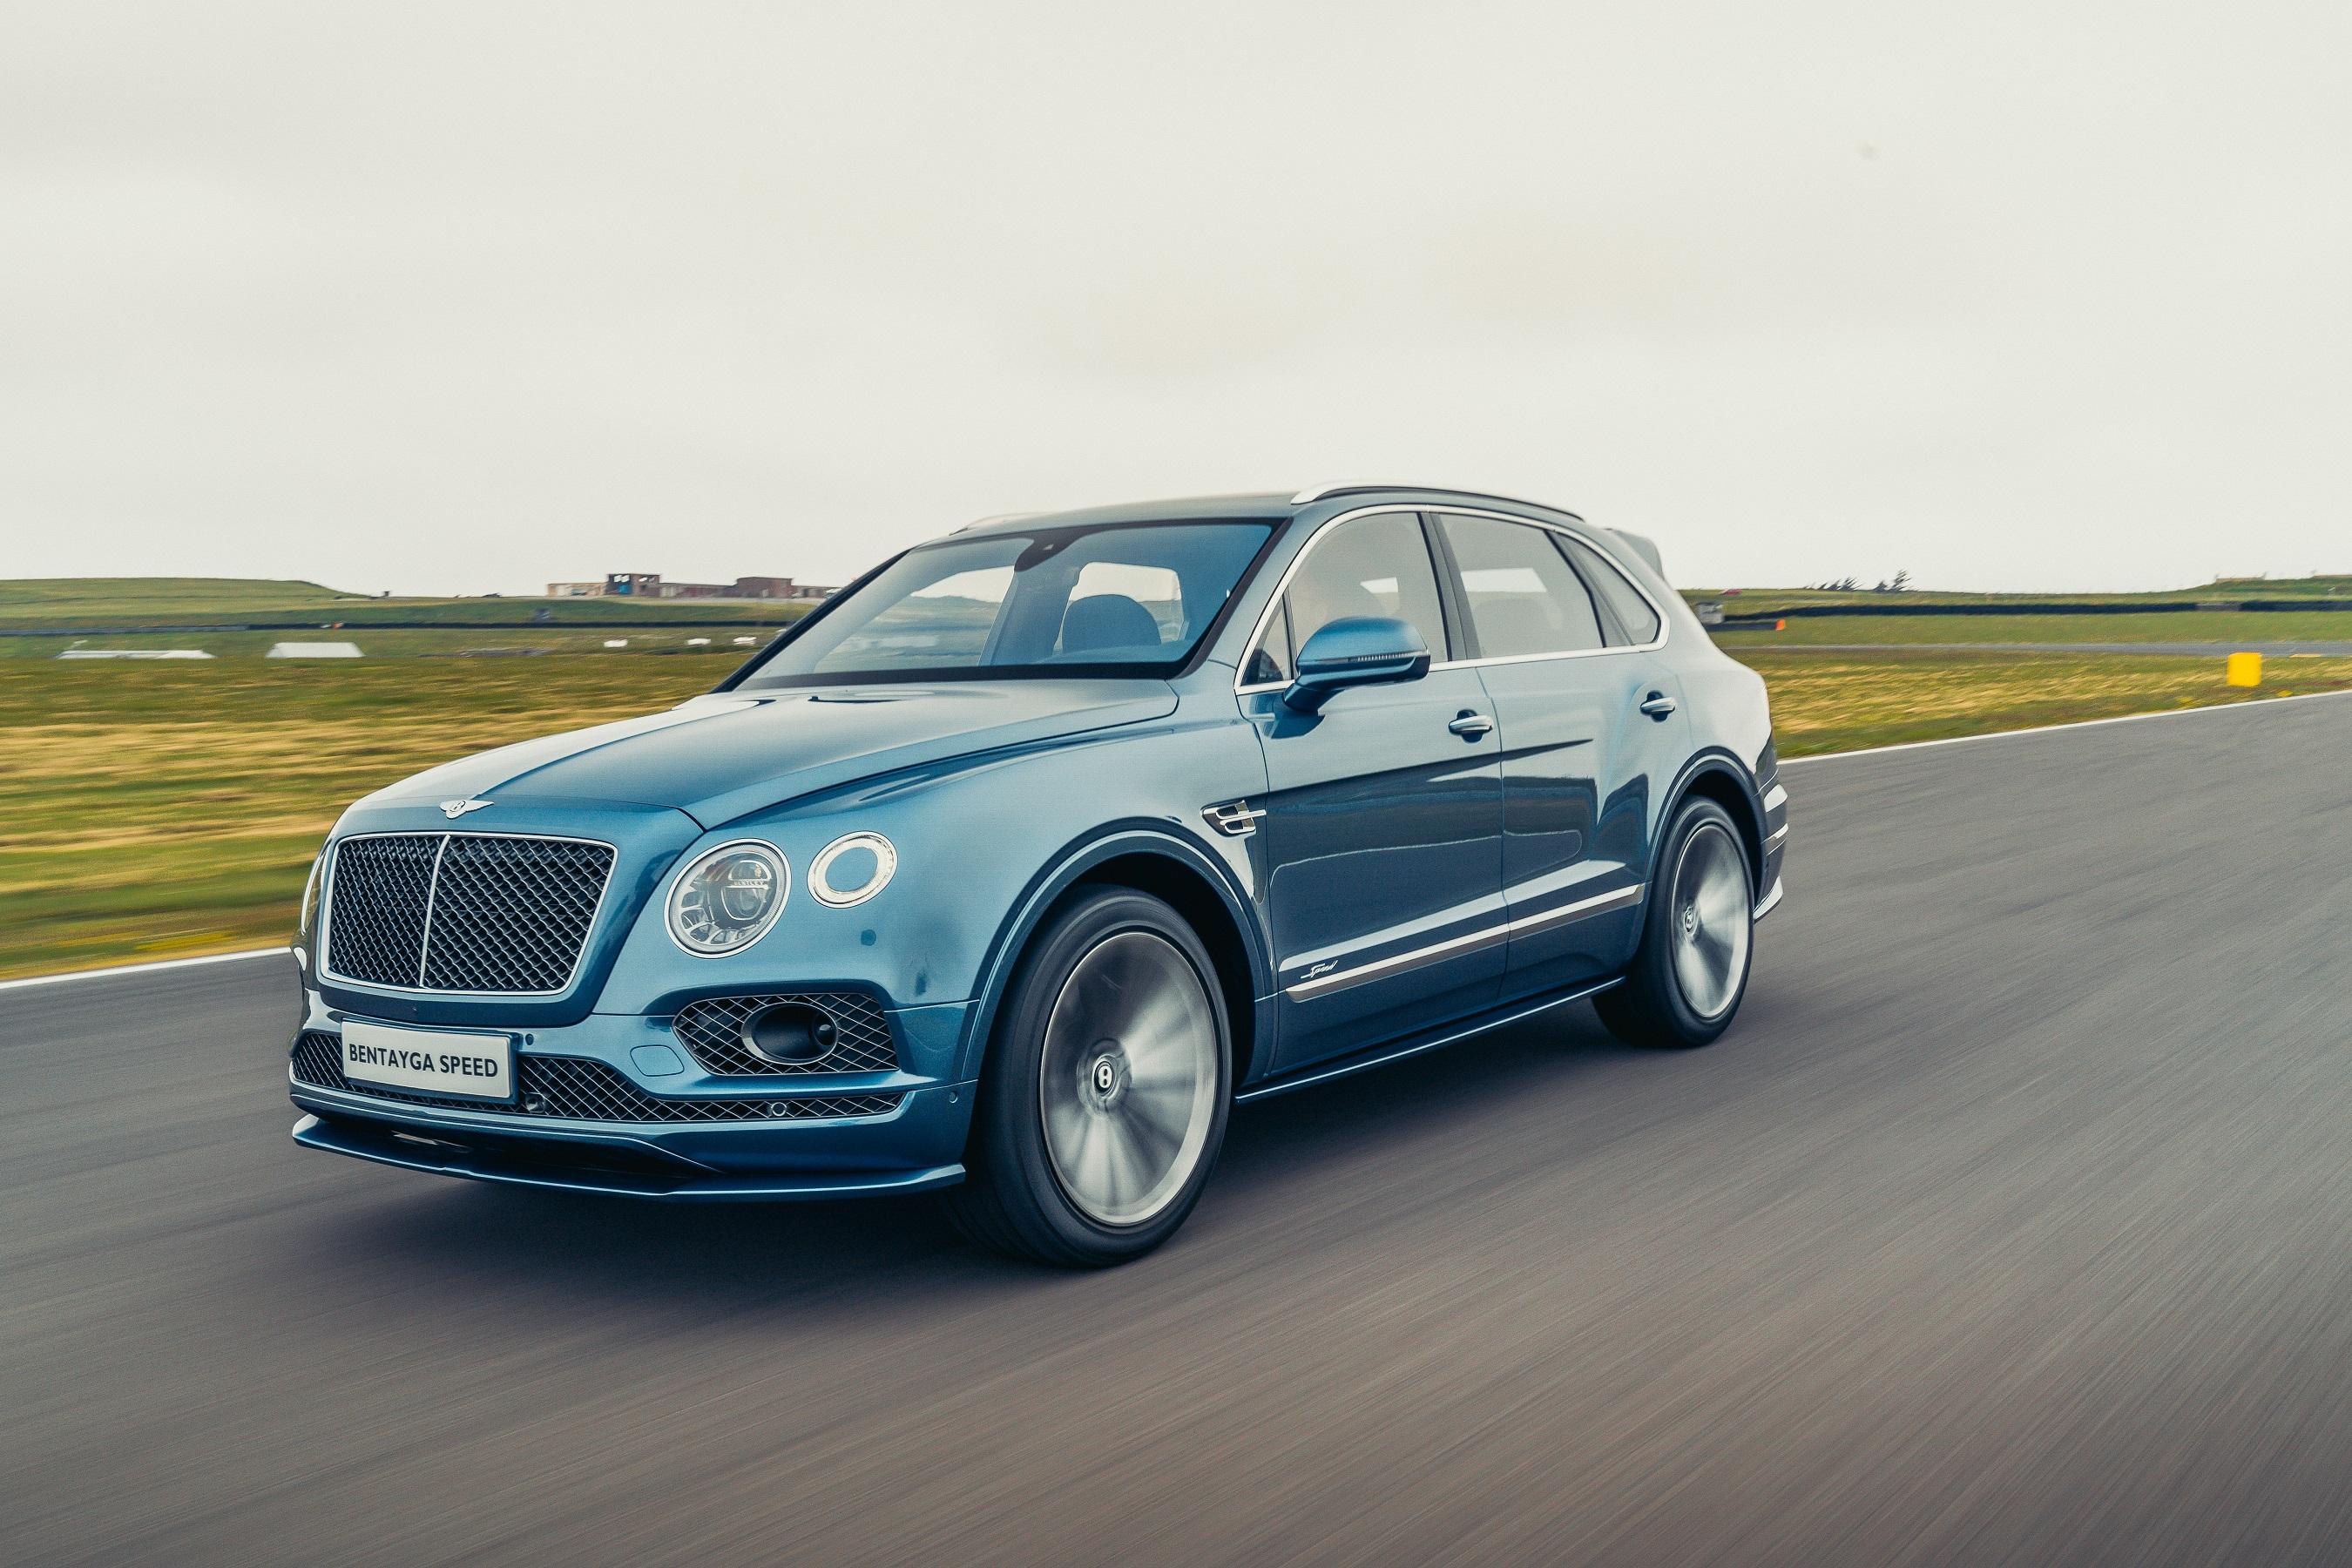 Bentley Bentayga Speed Review Like Drifting Buckingham Palace Torque